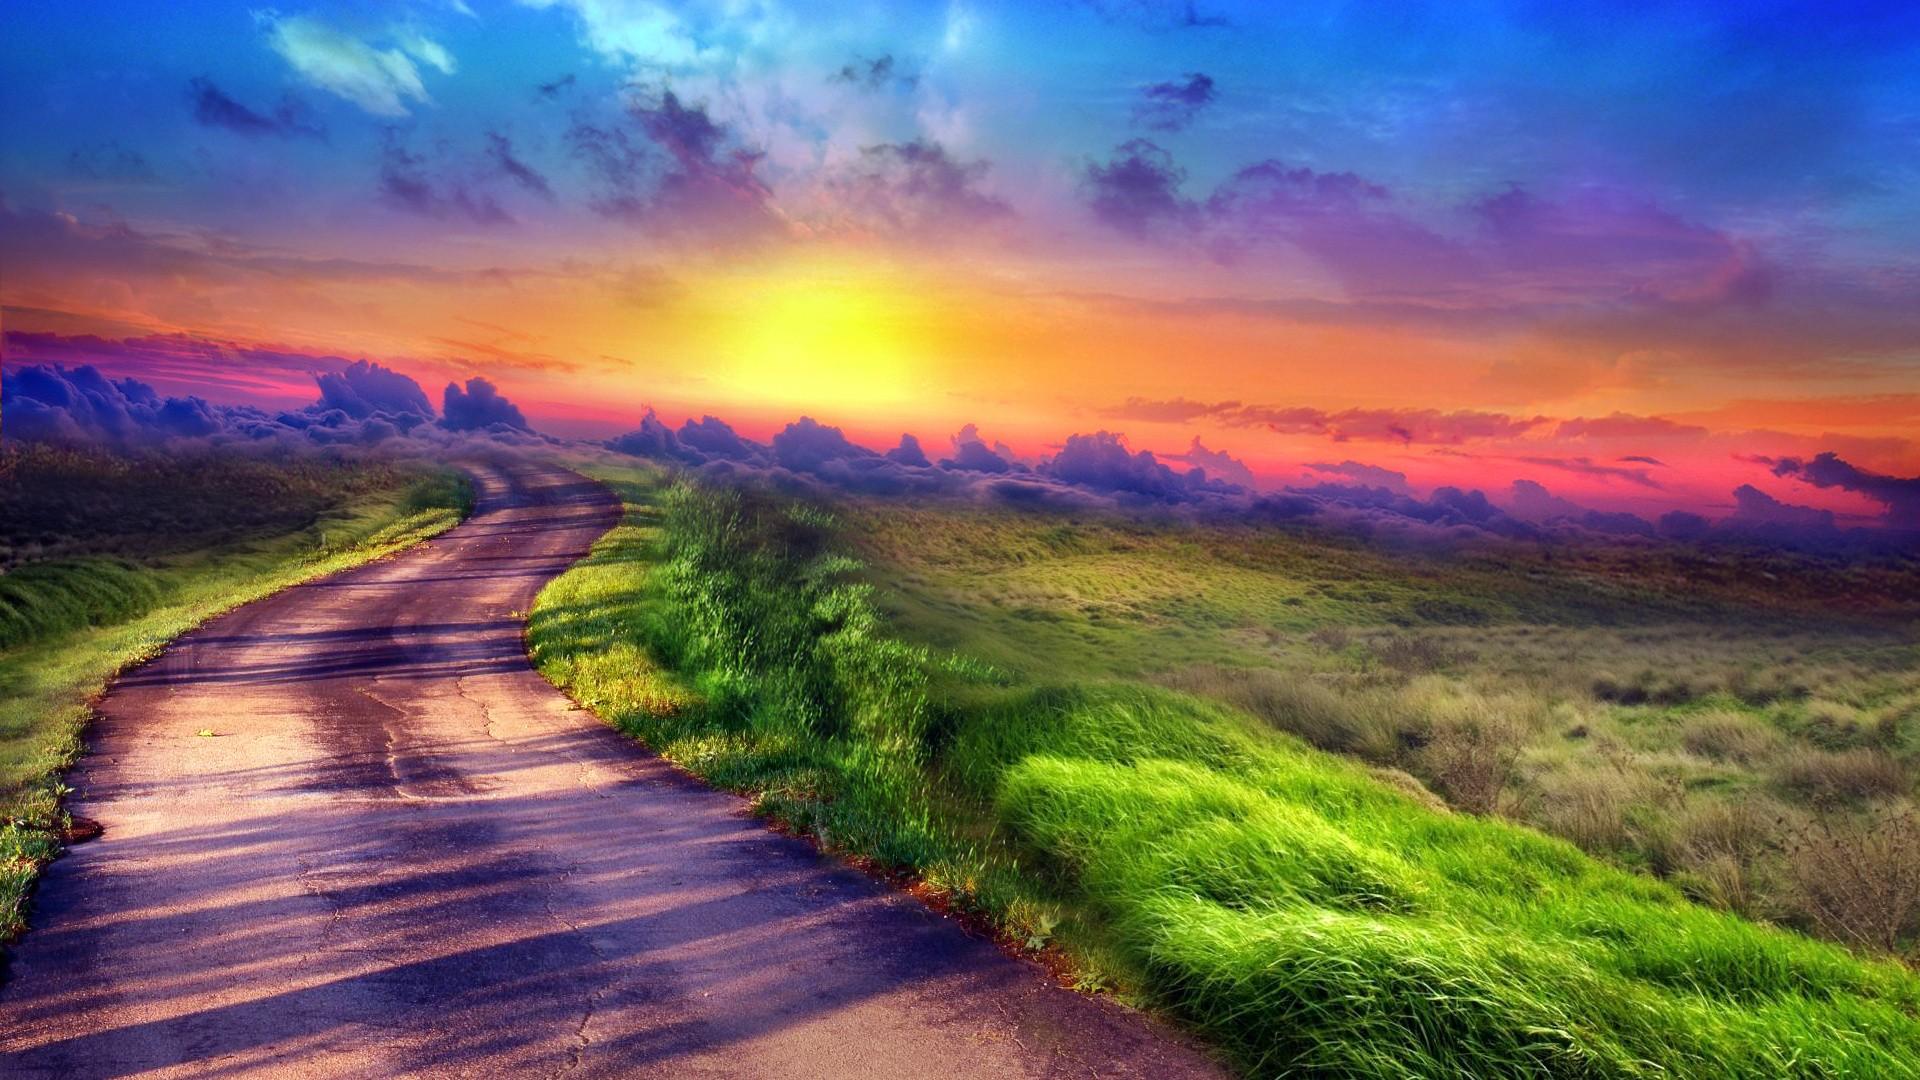 дорога поле закат облака небо загрузить